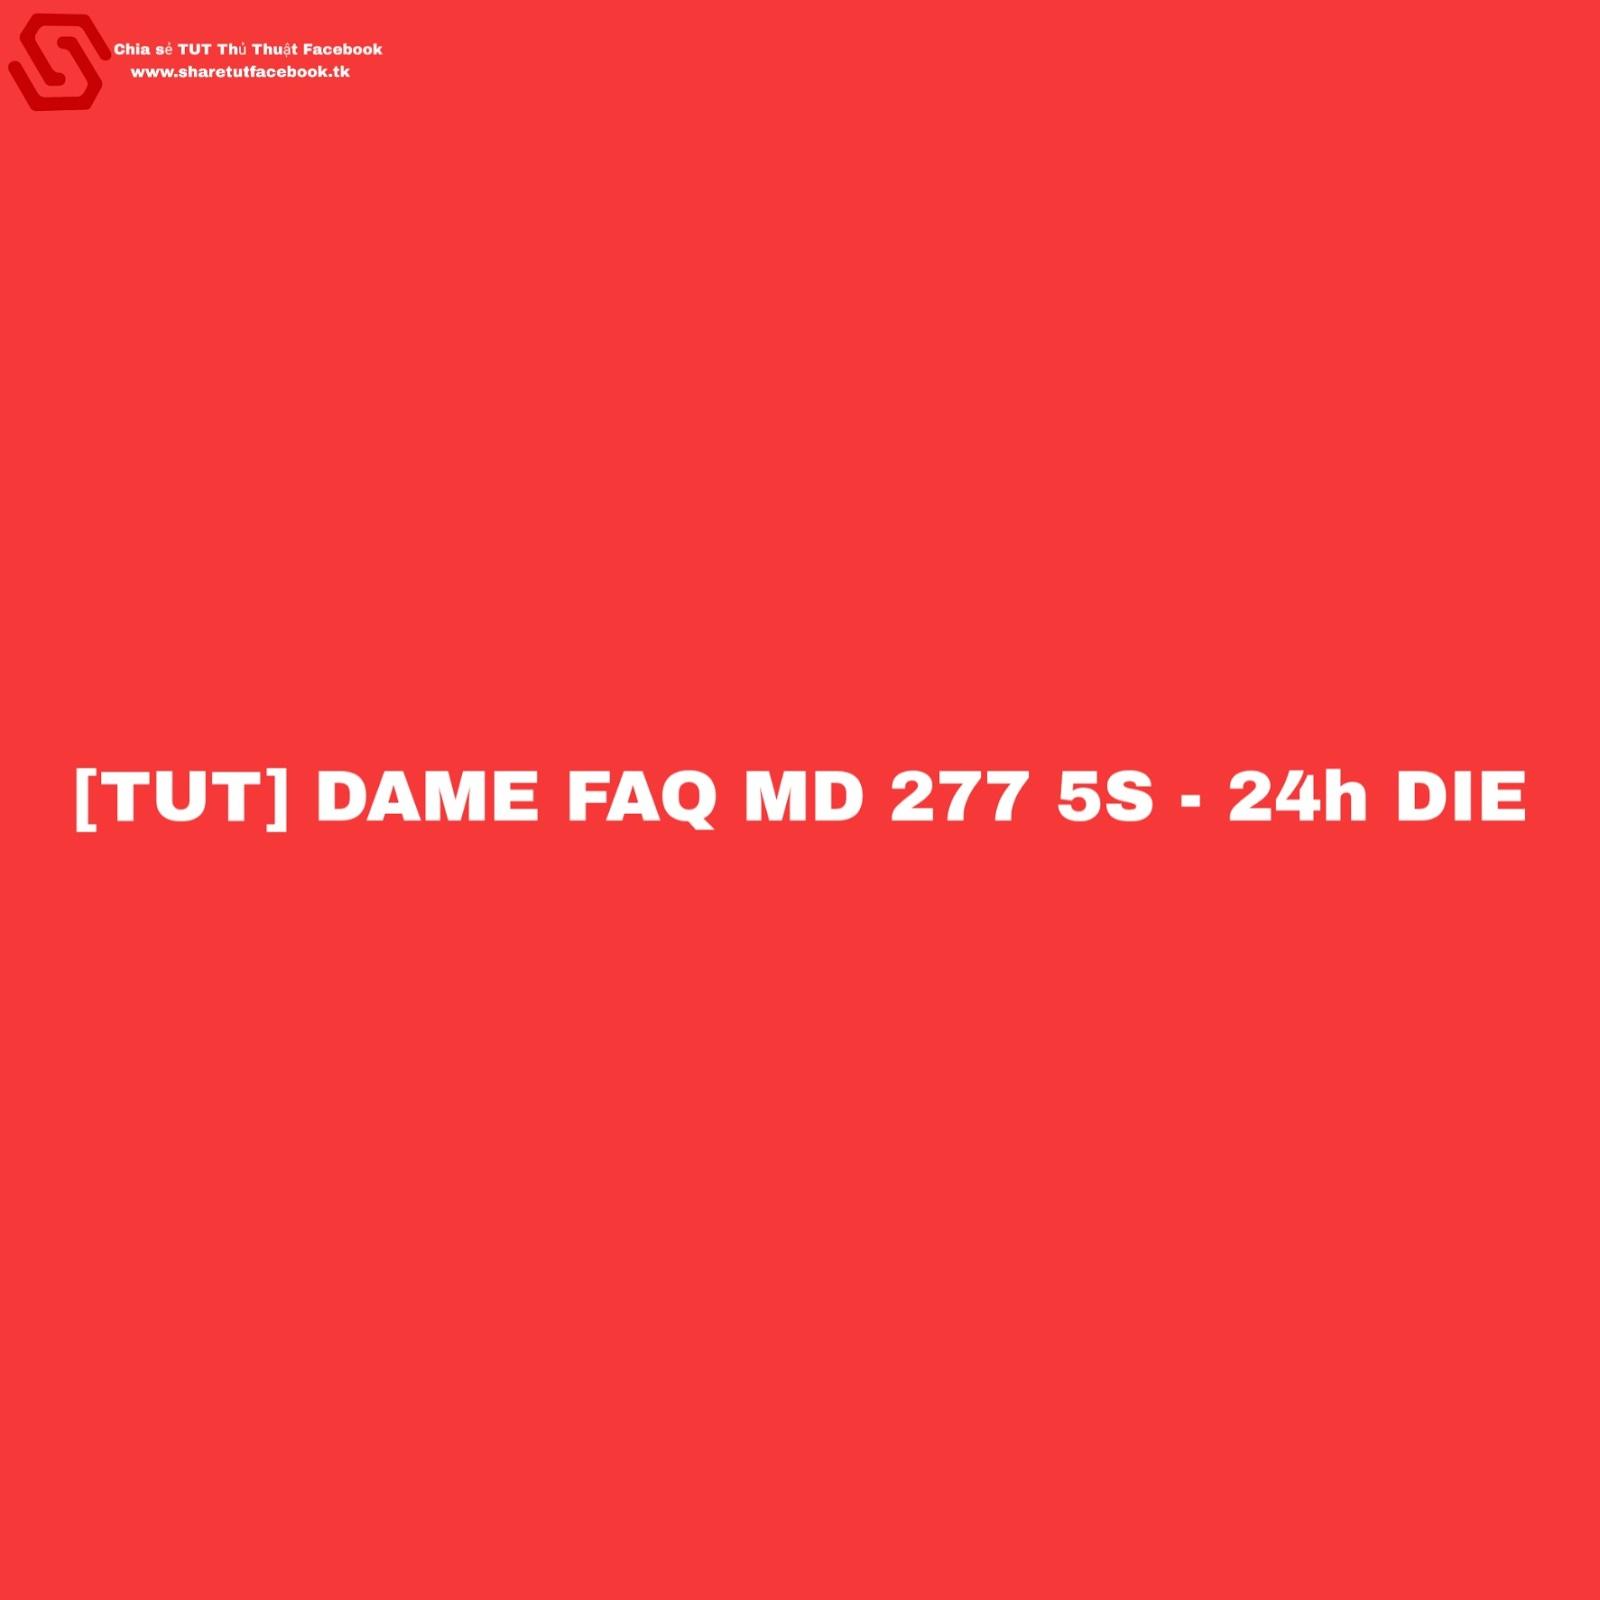 hướng dẫn cách dame faq 277 5s, tut dame faq md 277, hack ních facebook 5s, faq 277, faq md 277, faq md new ip mới, ip dame faq md 5s, ip dame 5s